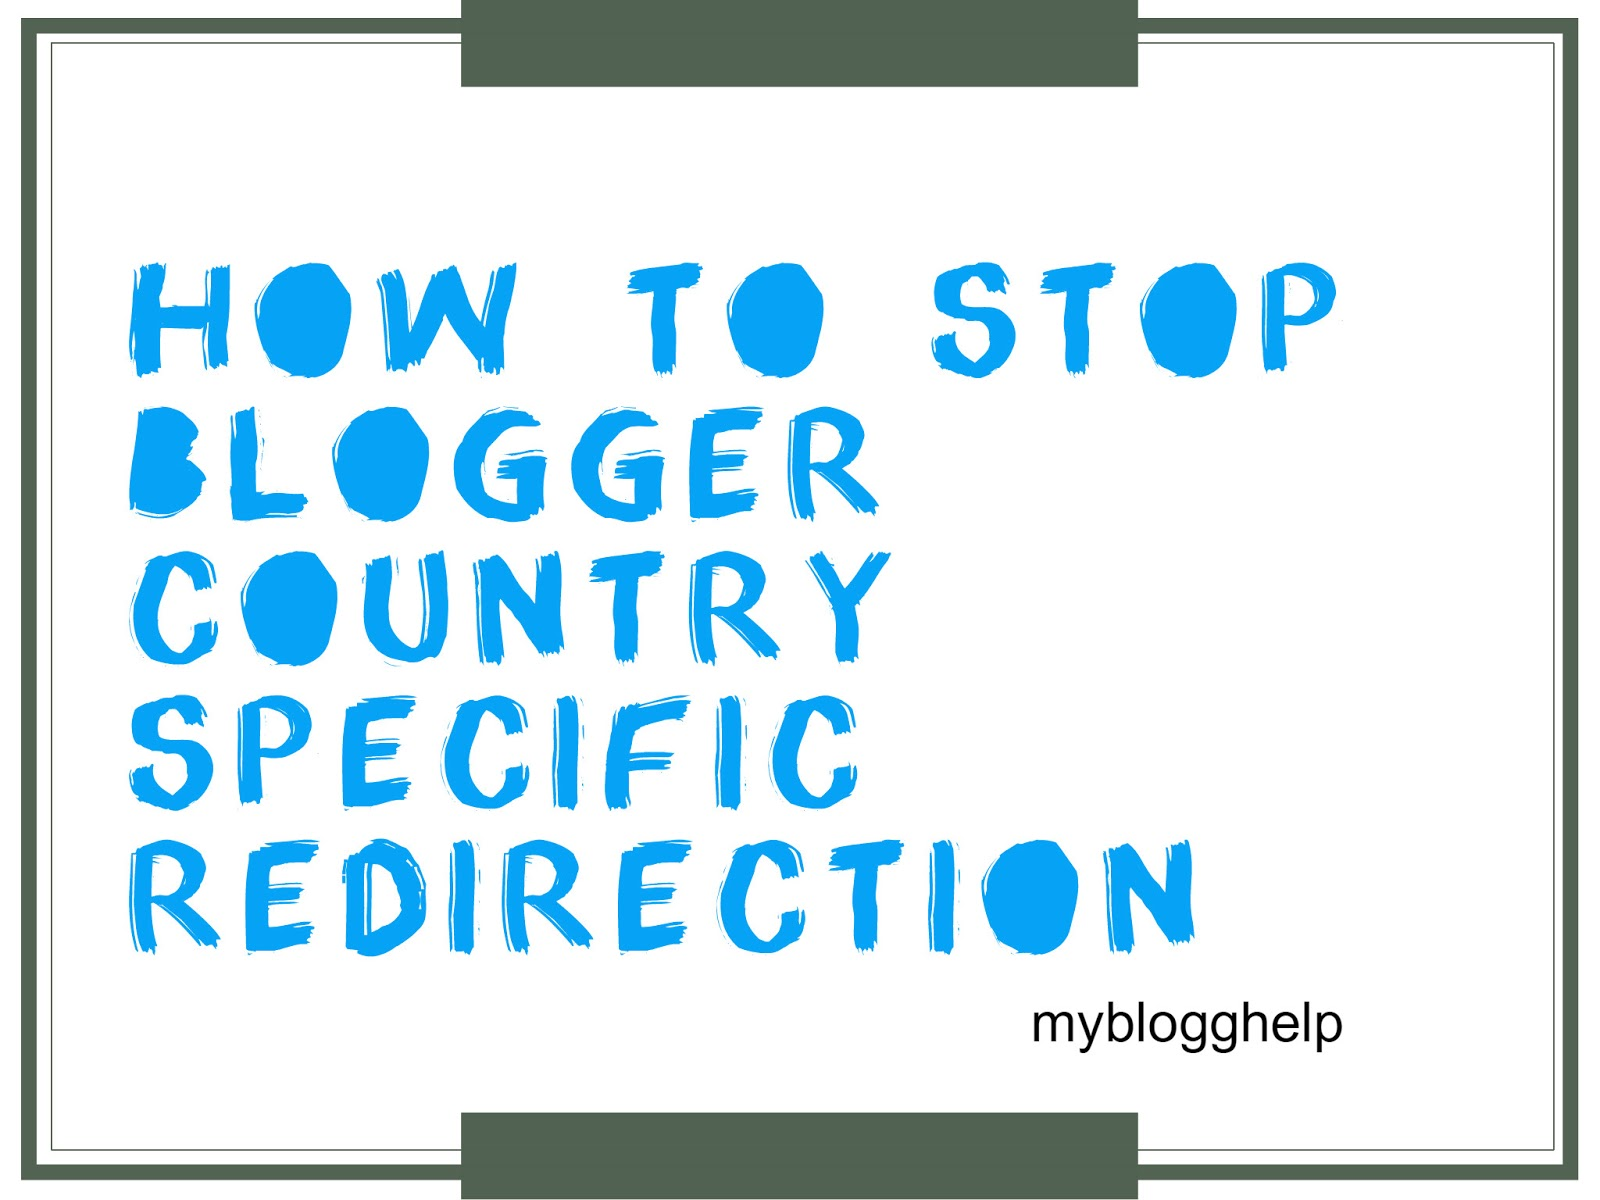 how to stop redirection on putlocker